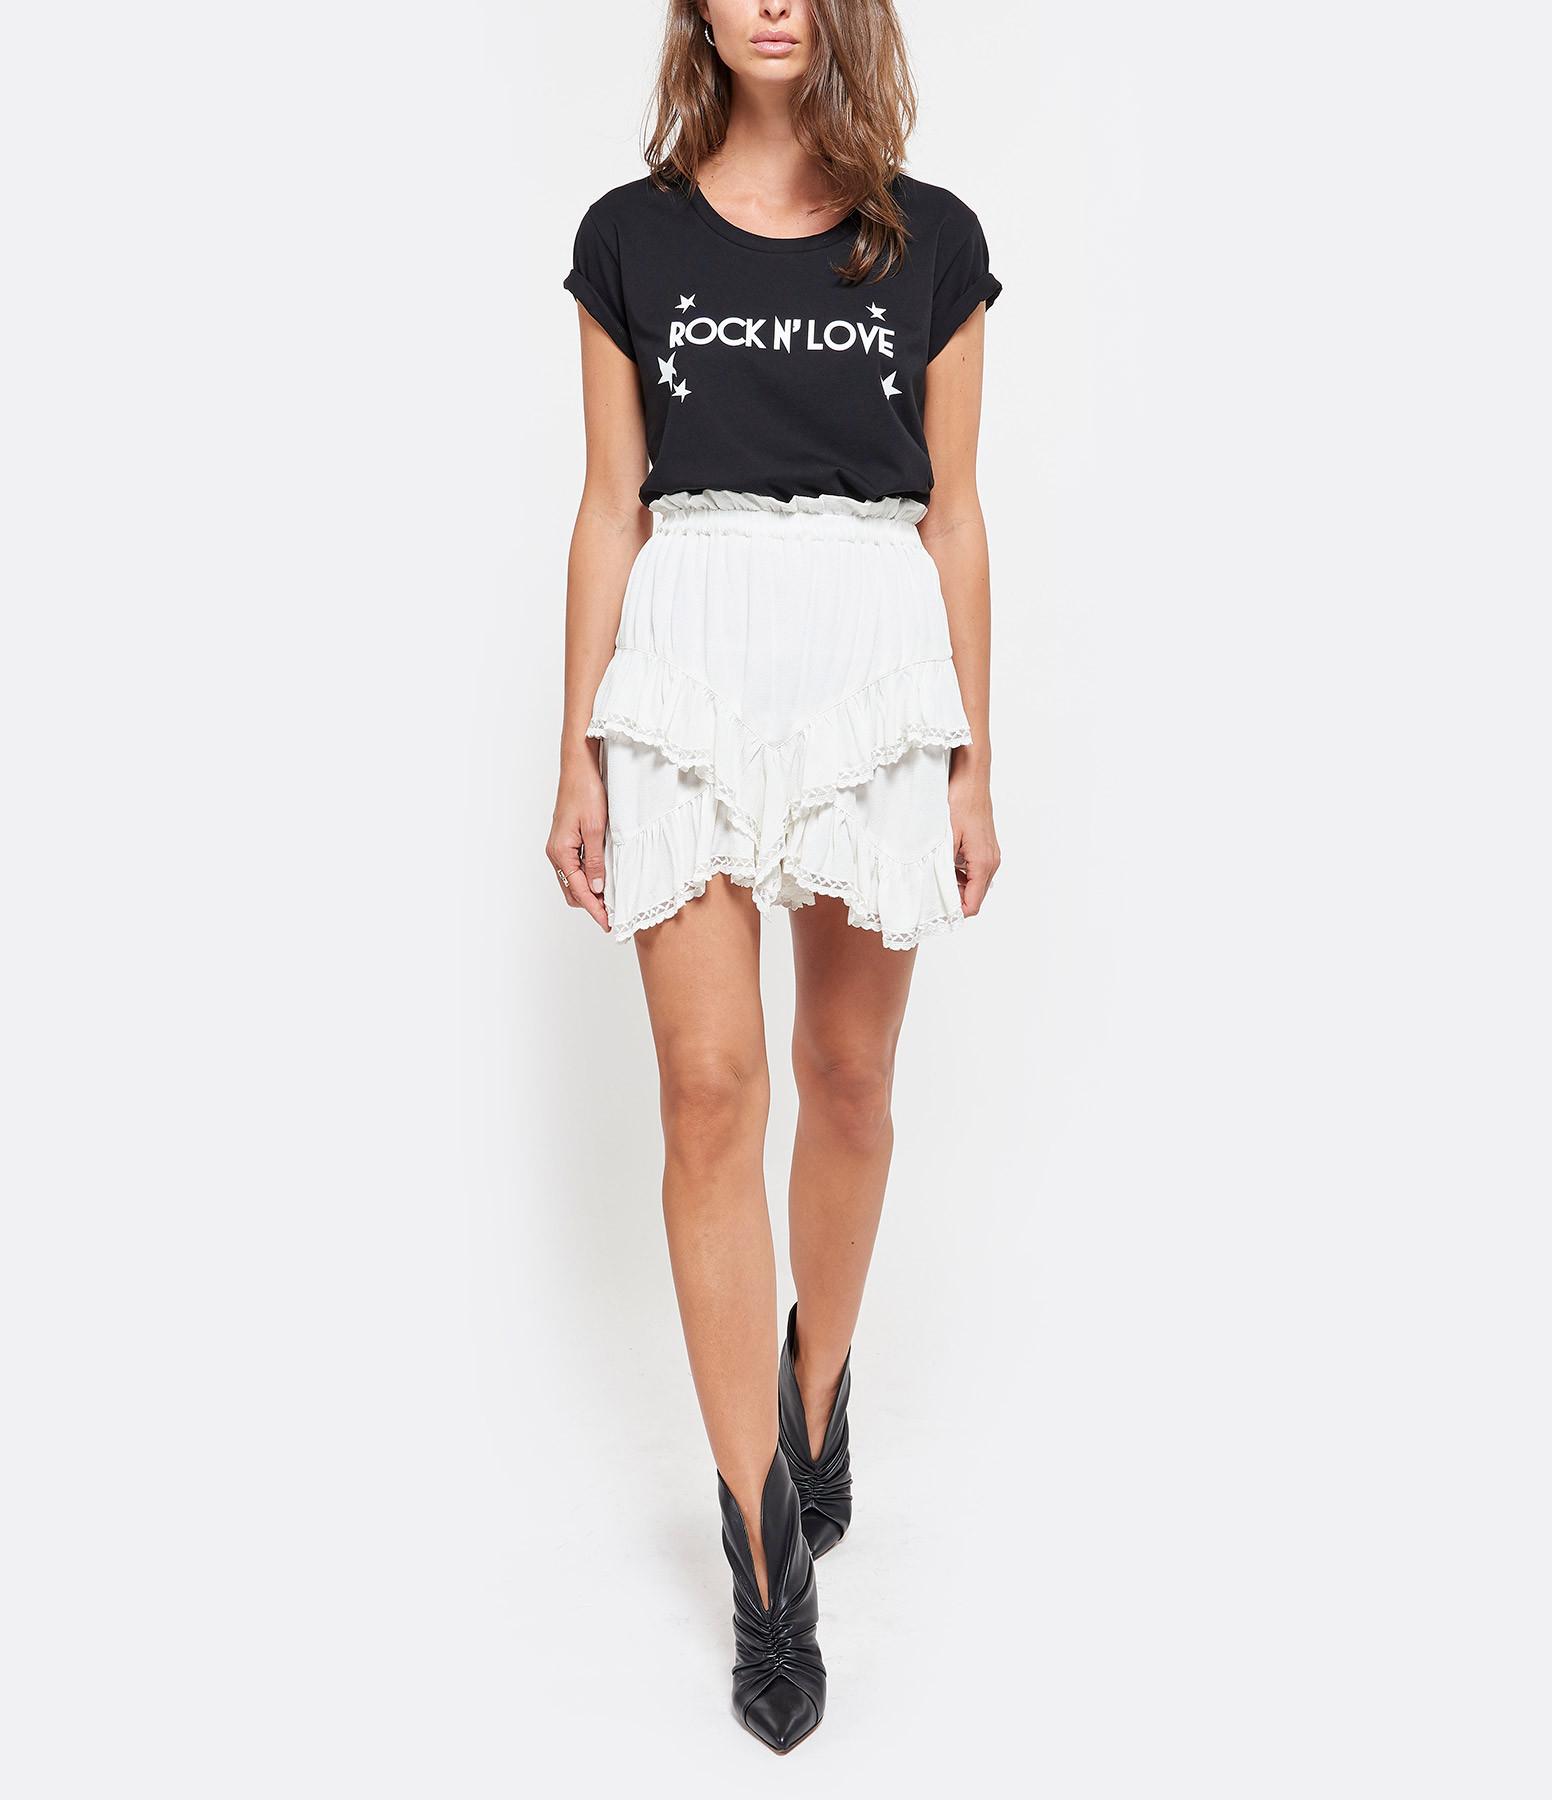 JEANNE VOULAND - Tee-shirt Eder Rock n' Love Coton Noir